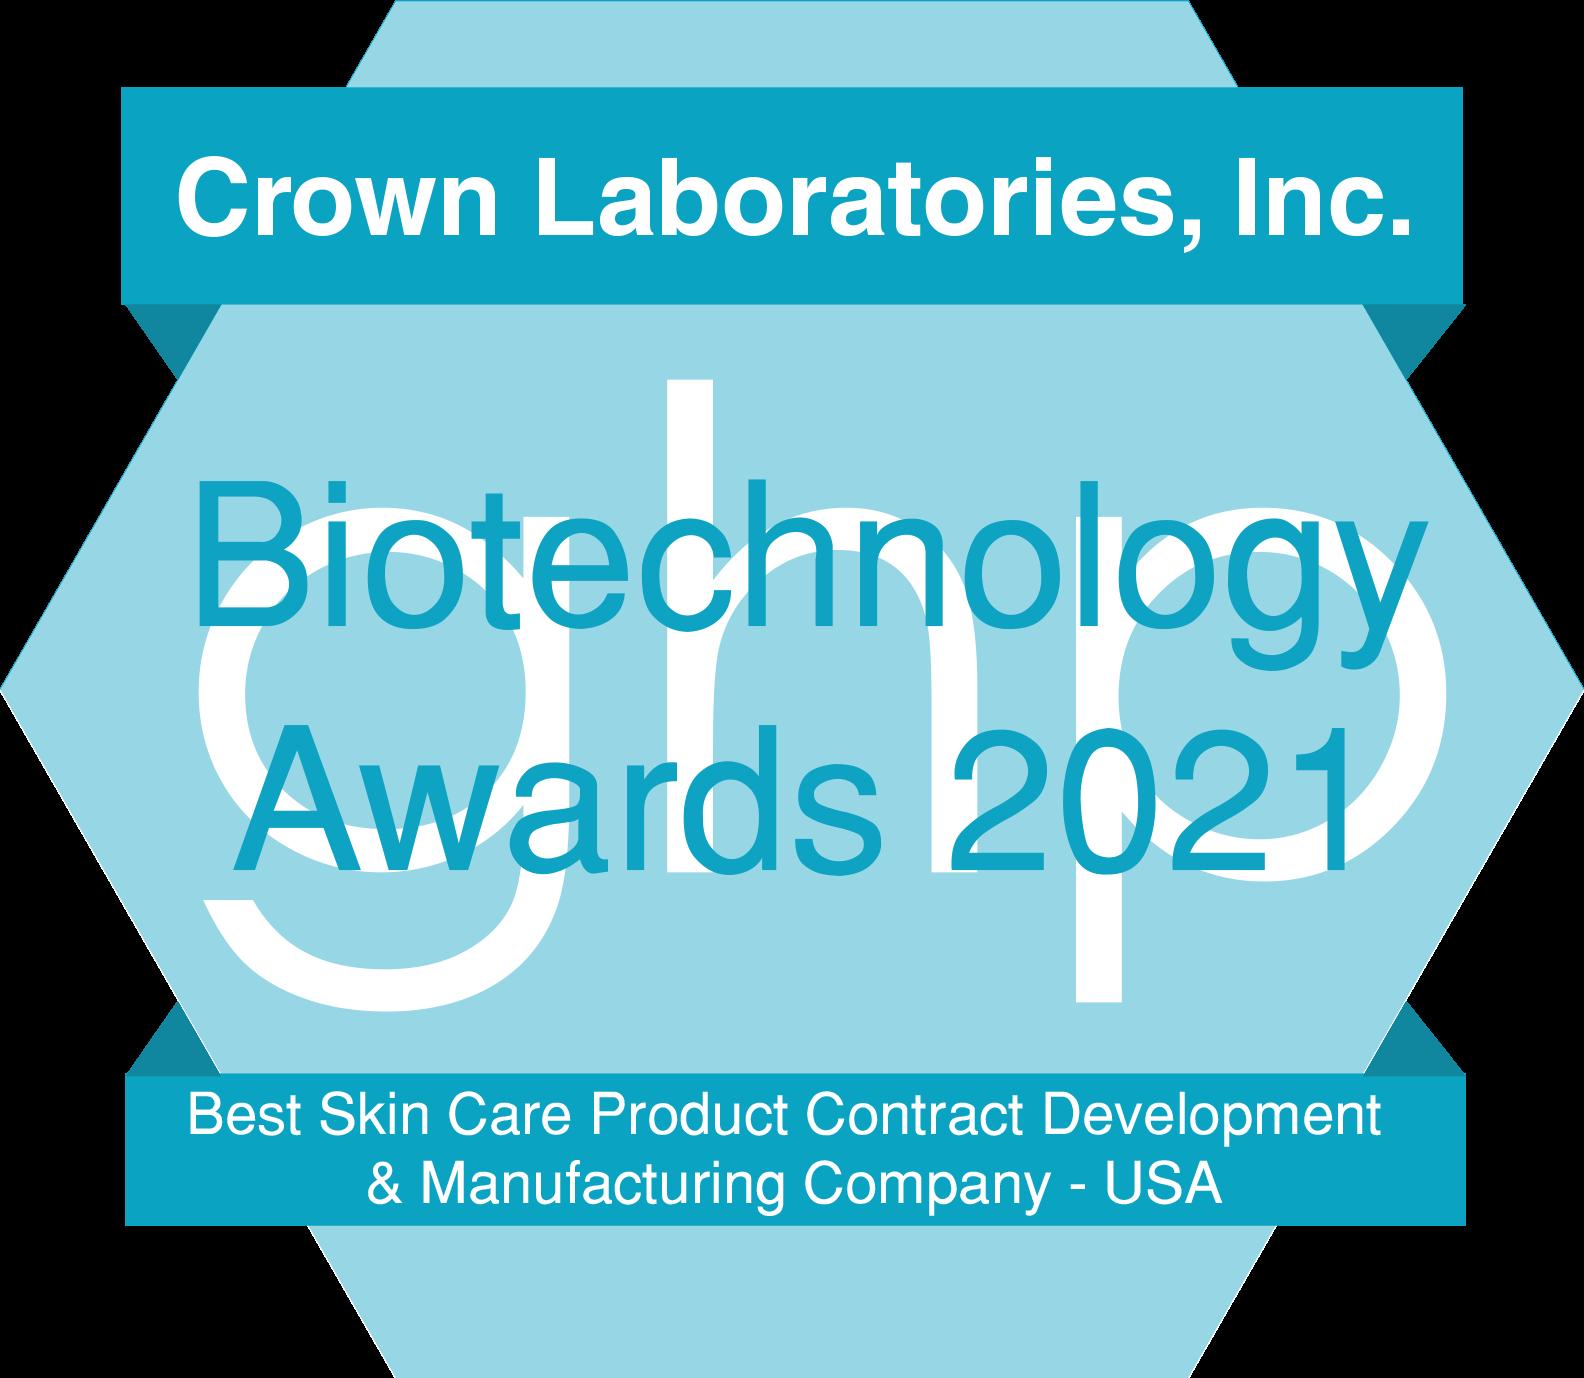 Biotechnology Awards 2021 Winners Logo